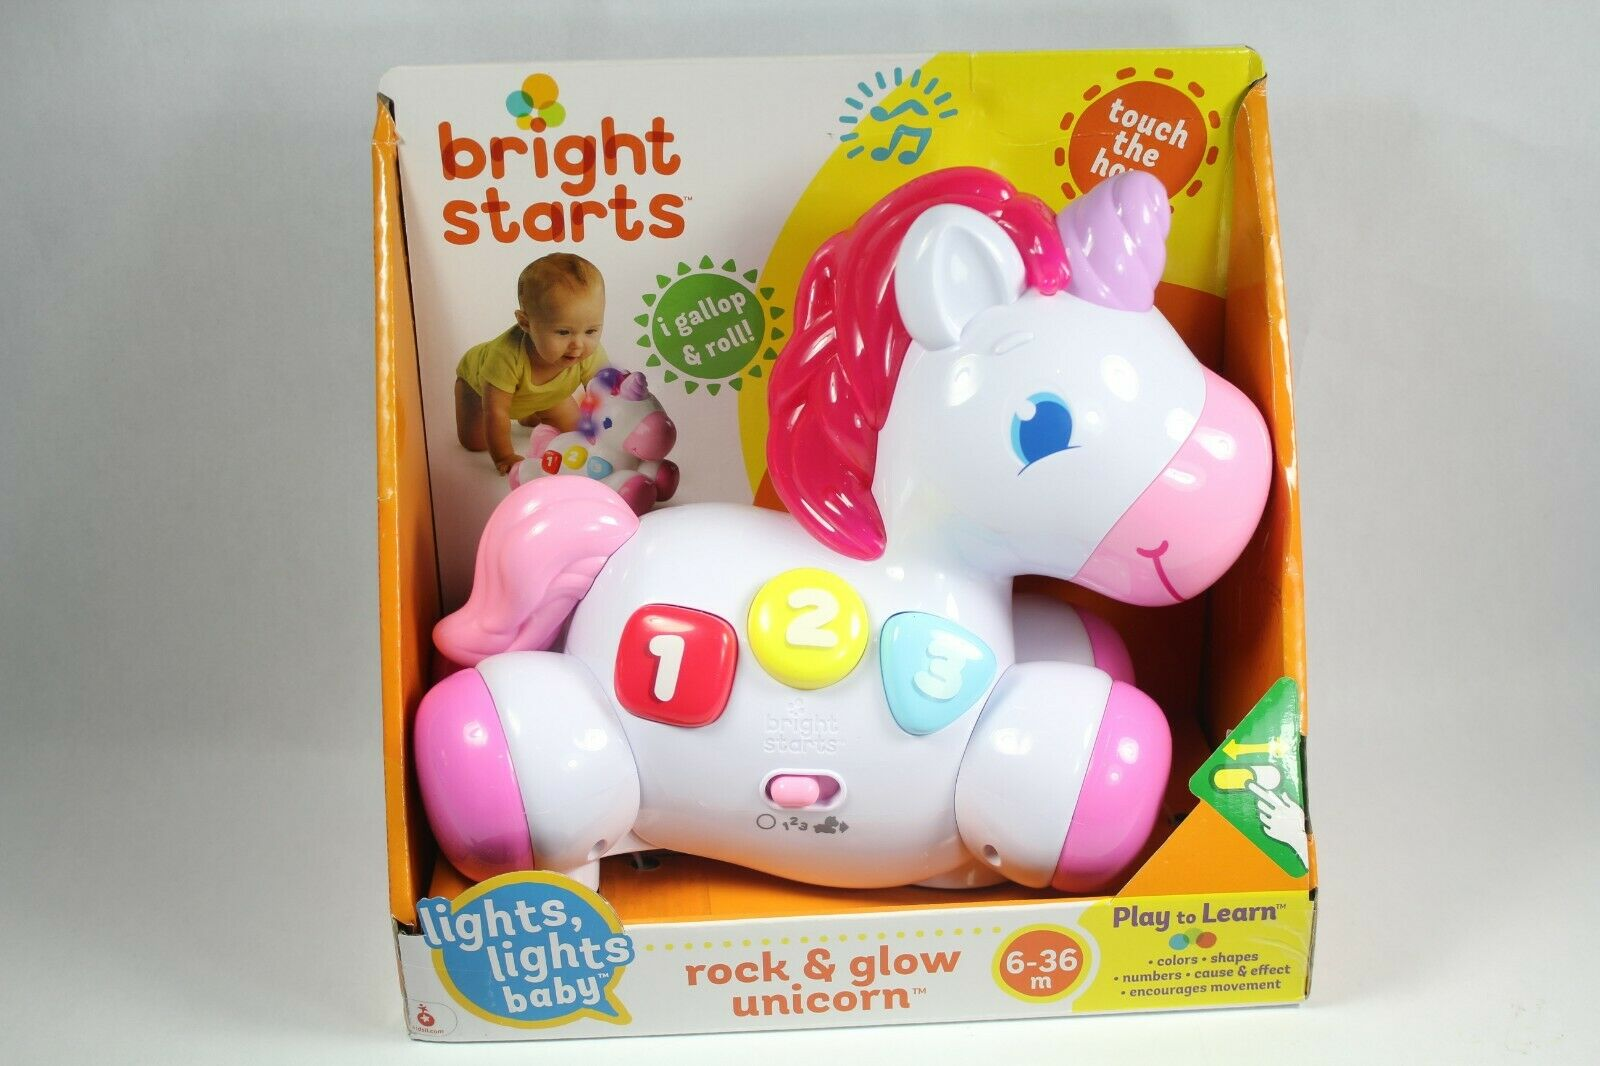 Bright Starts Rock and Glow Unicorn Toy